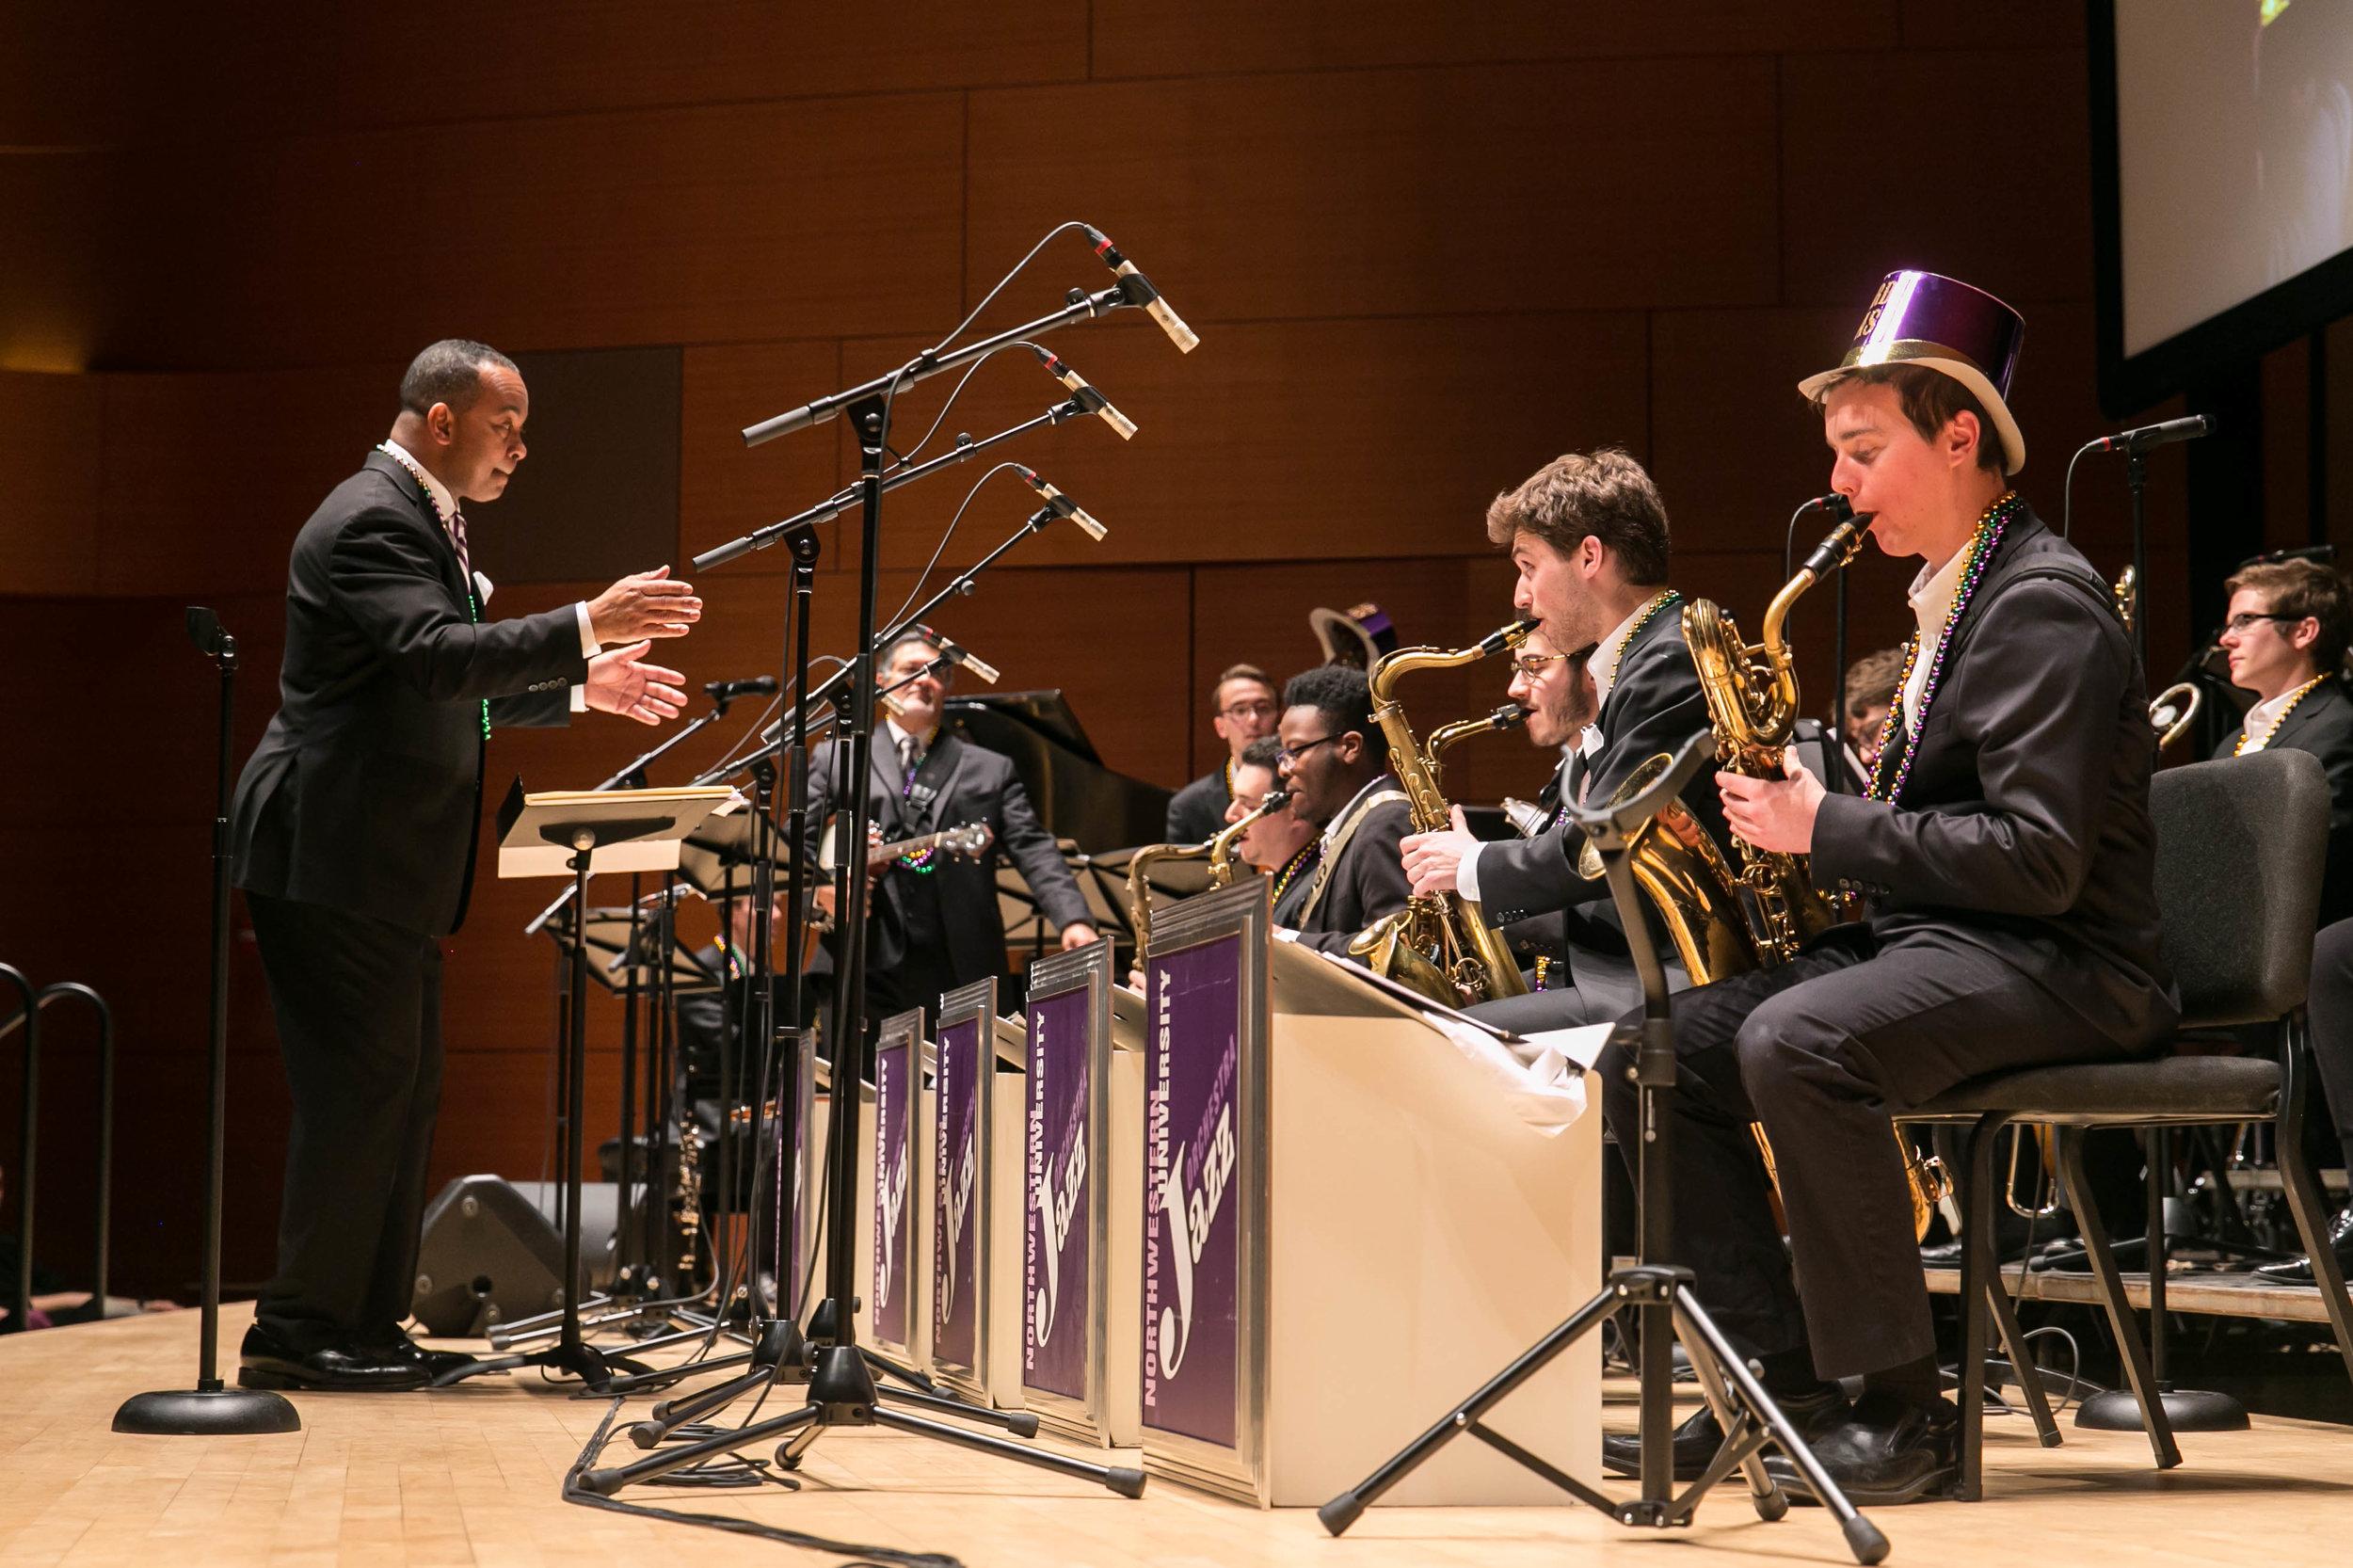 Victor Goines leads the Northwestern University Jazz Orchestra on Mardi Gras, February 13, 2018.